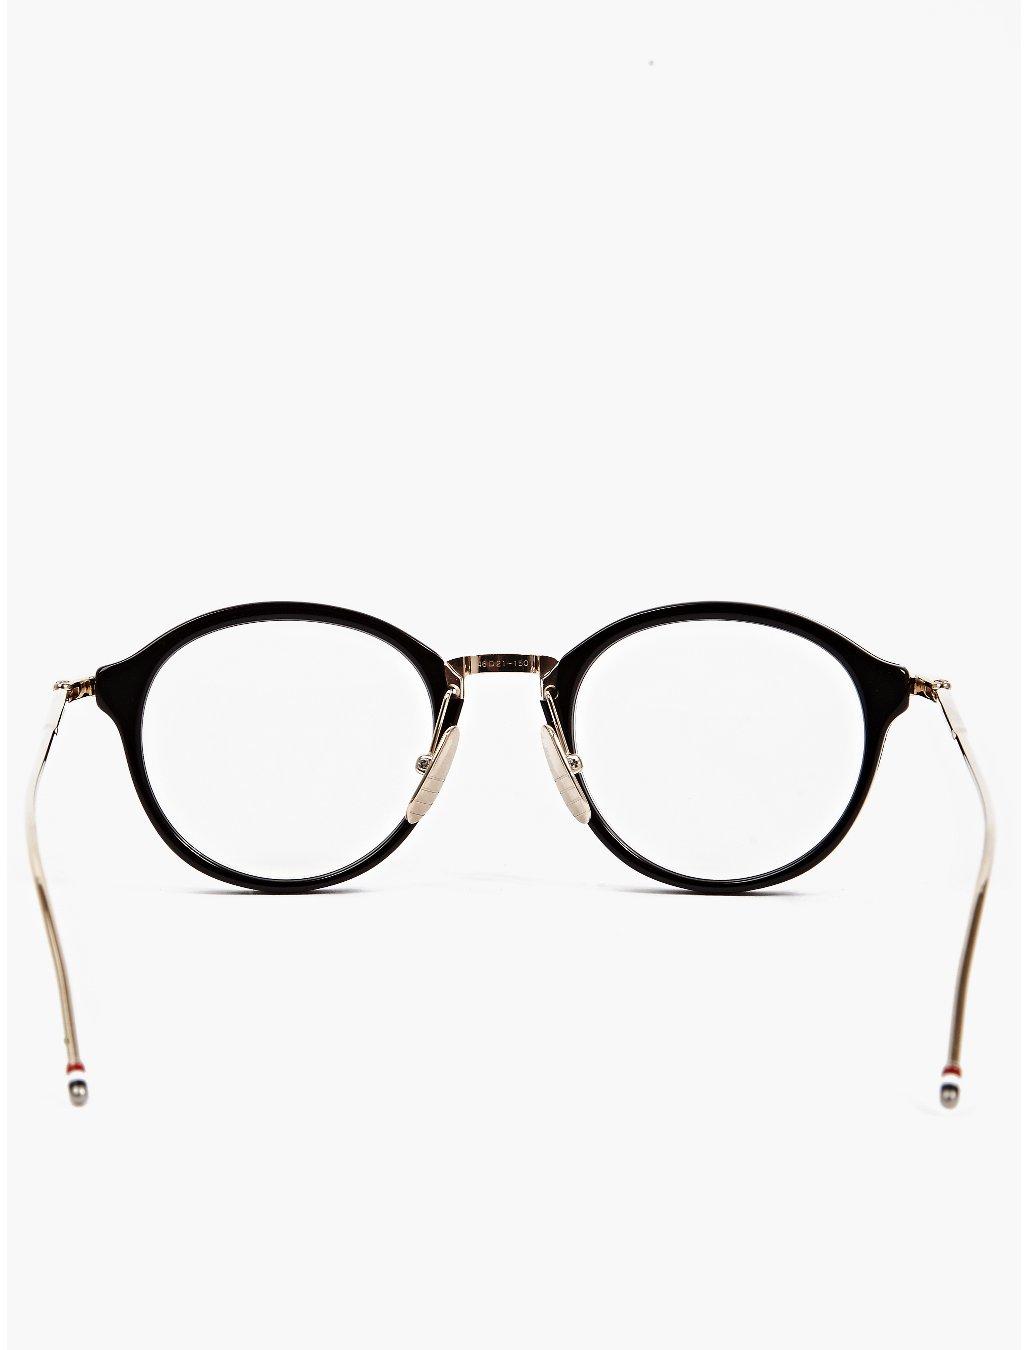 cheap real oakley holbrook sunglasses dimensions cepar Oakley Eyeglass Frames cheap real oakley holbrook sunglasses dimensions